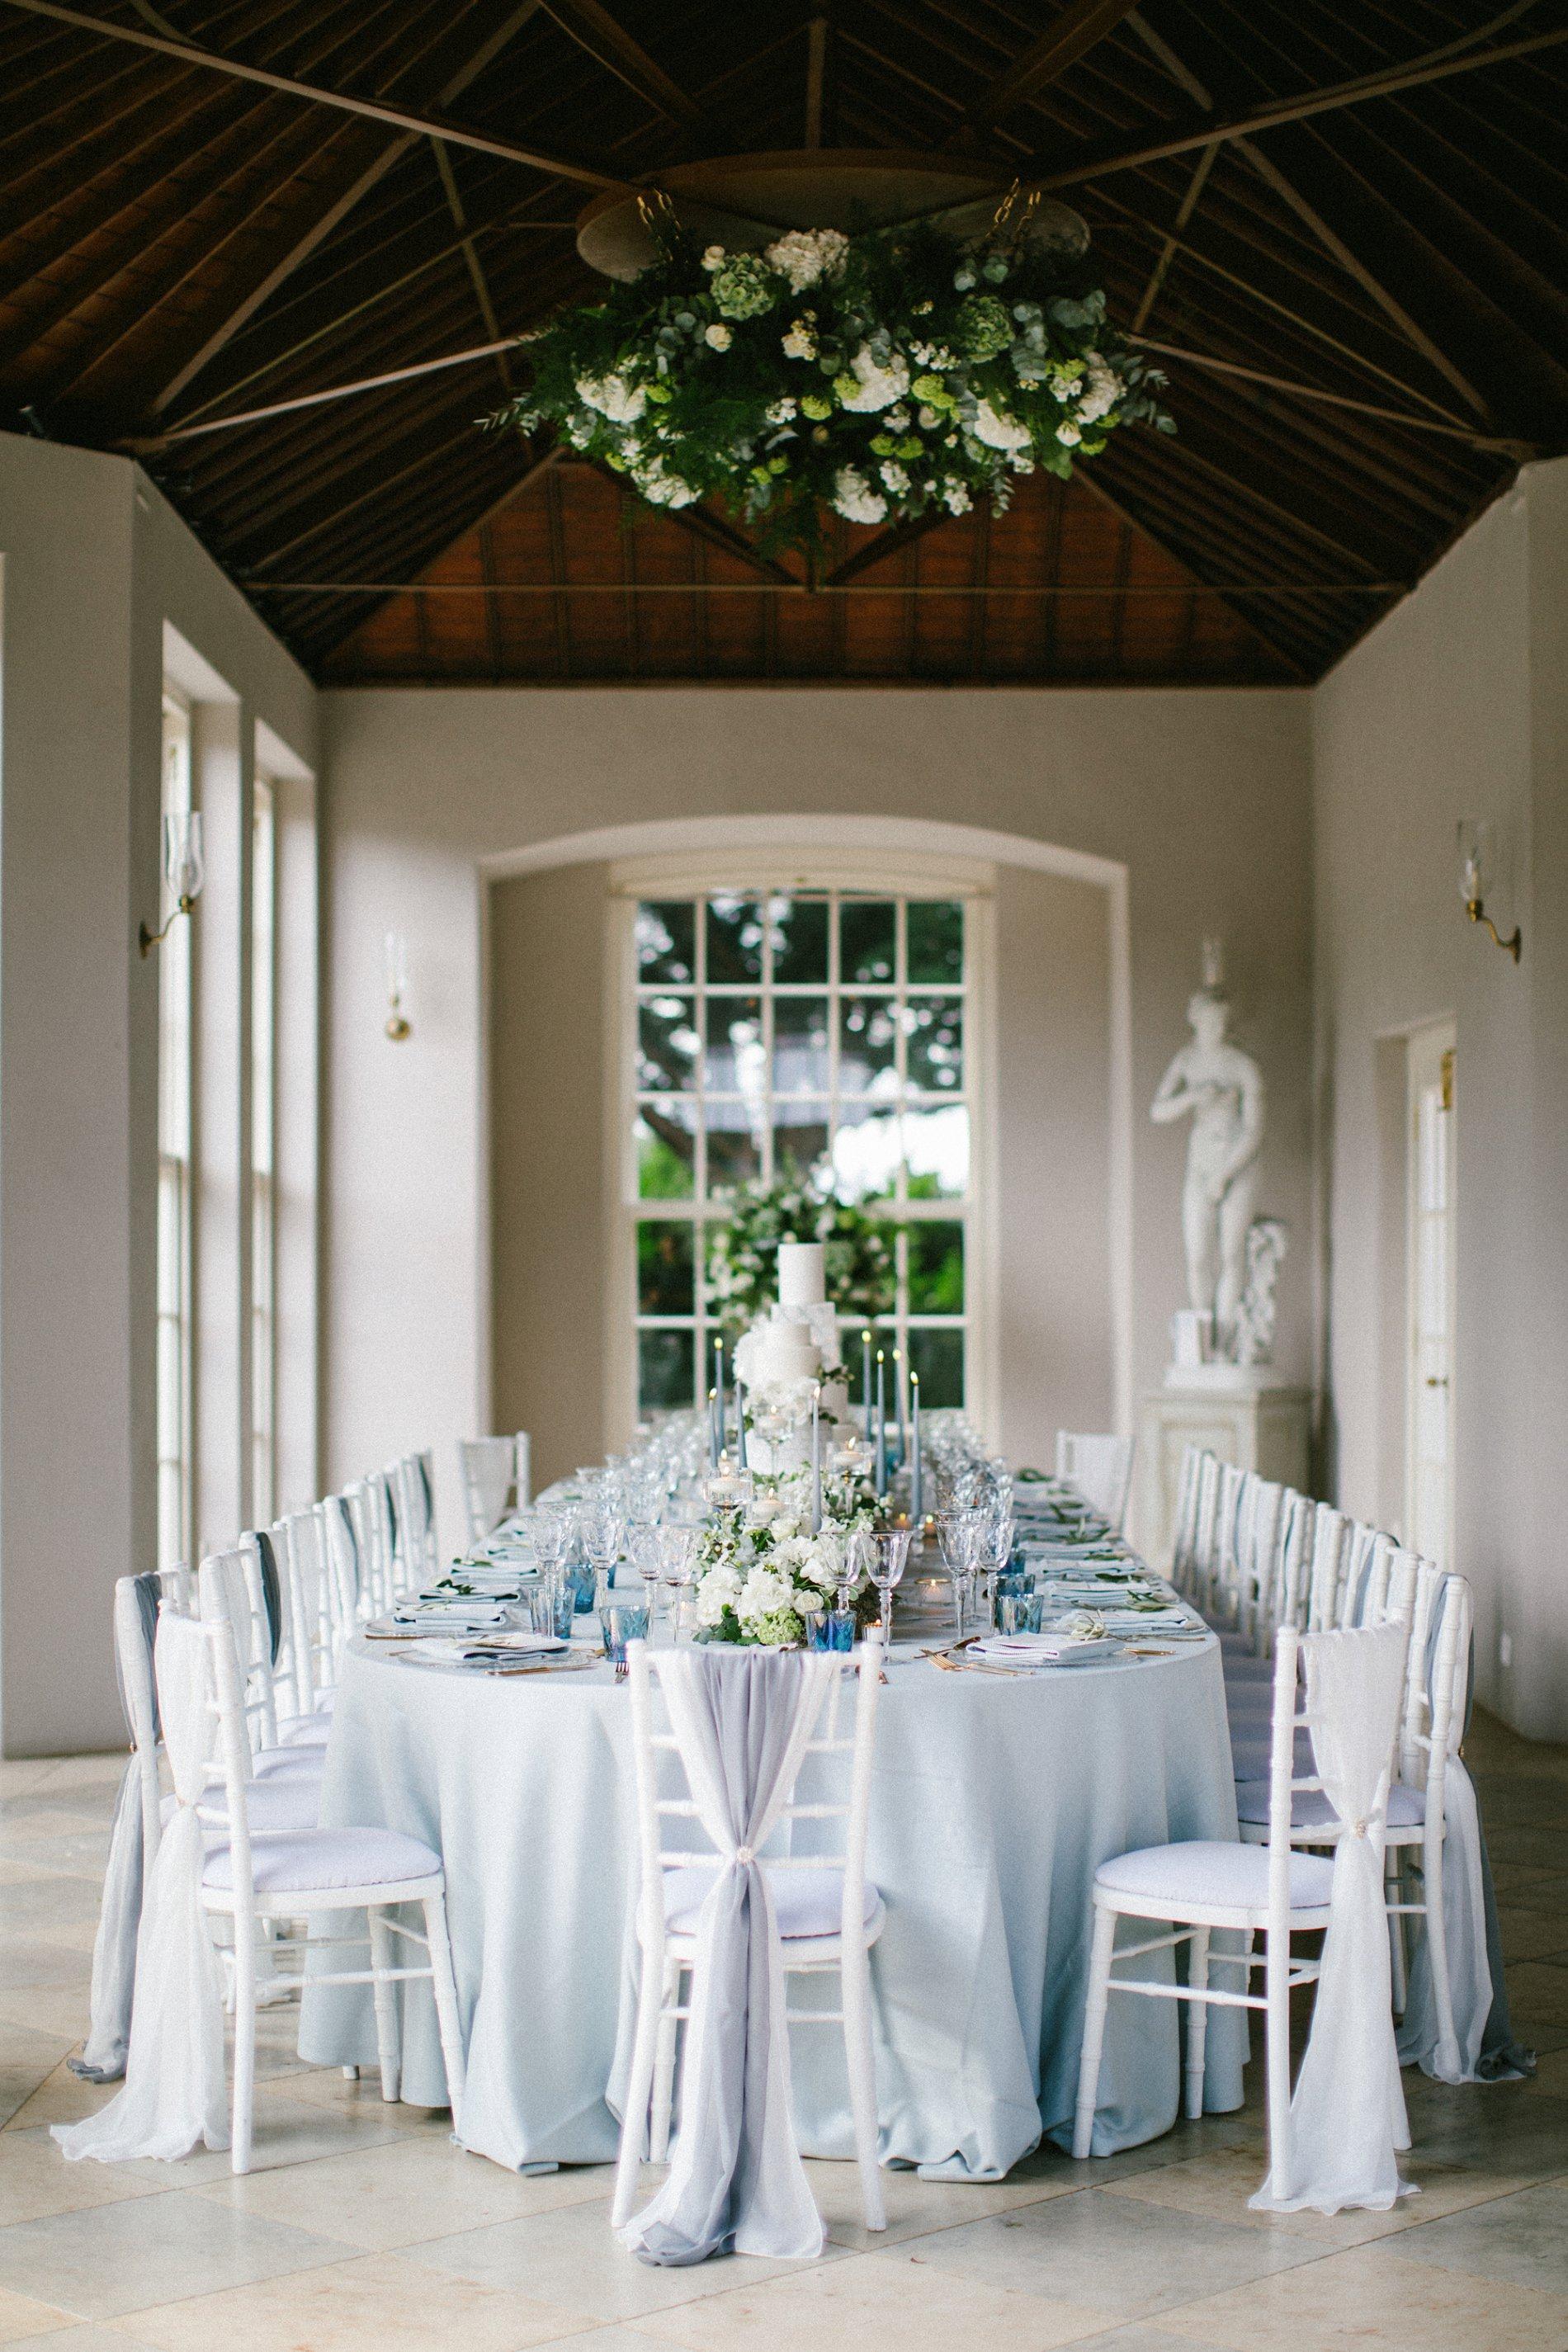 An Intimate Fine Art Wedding Shoot at Newby Hall (c) Melissa Beattie Photography (25)